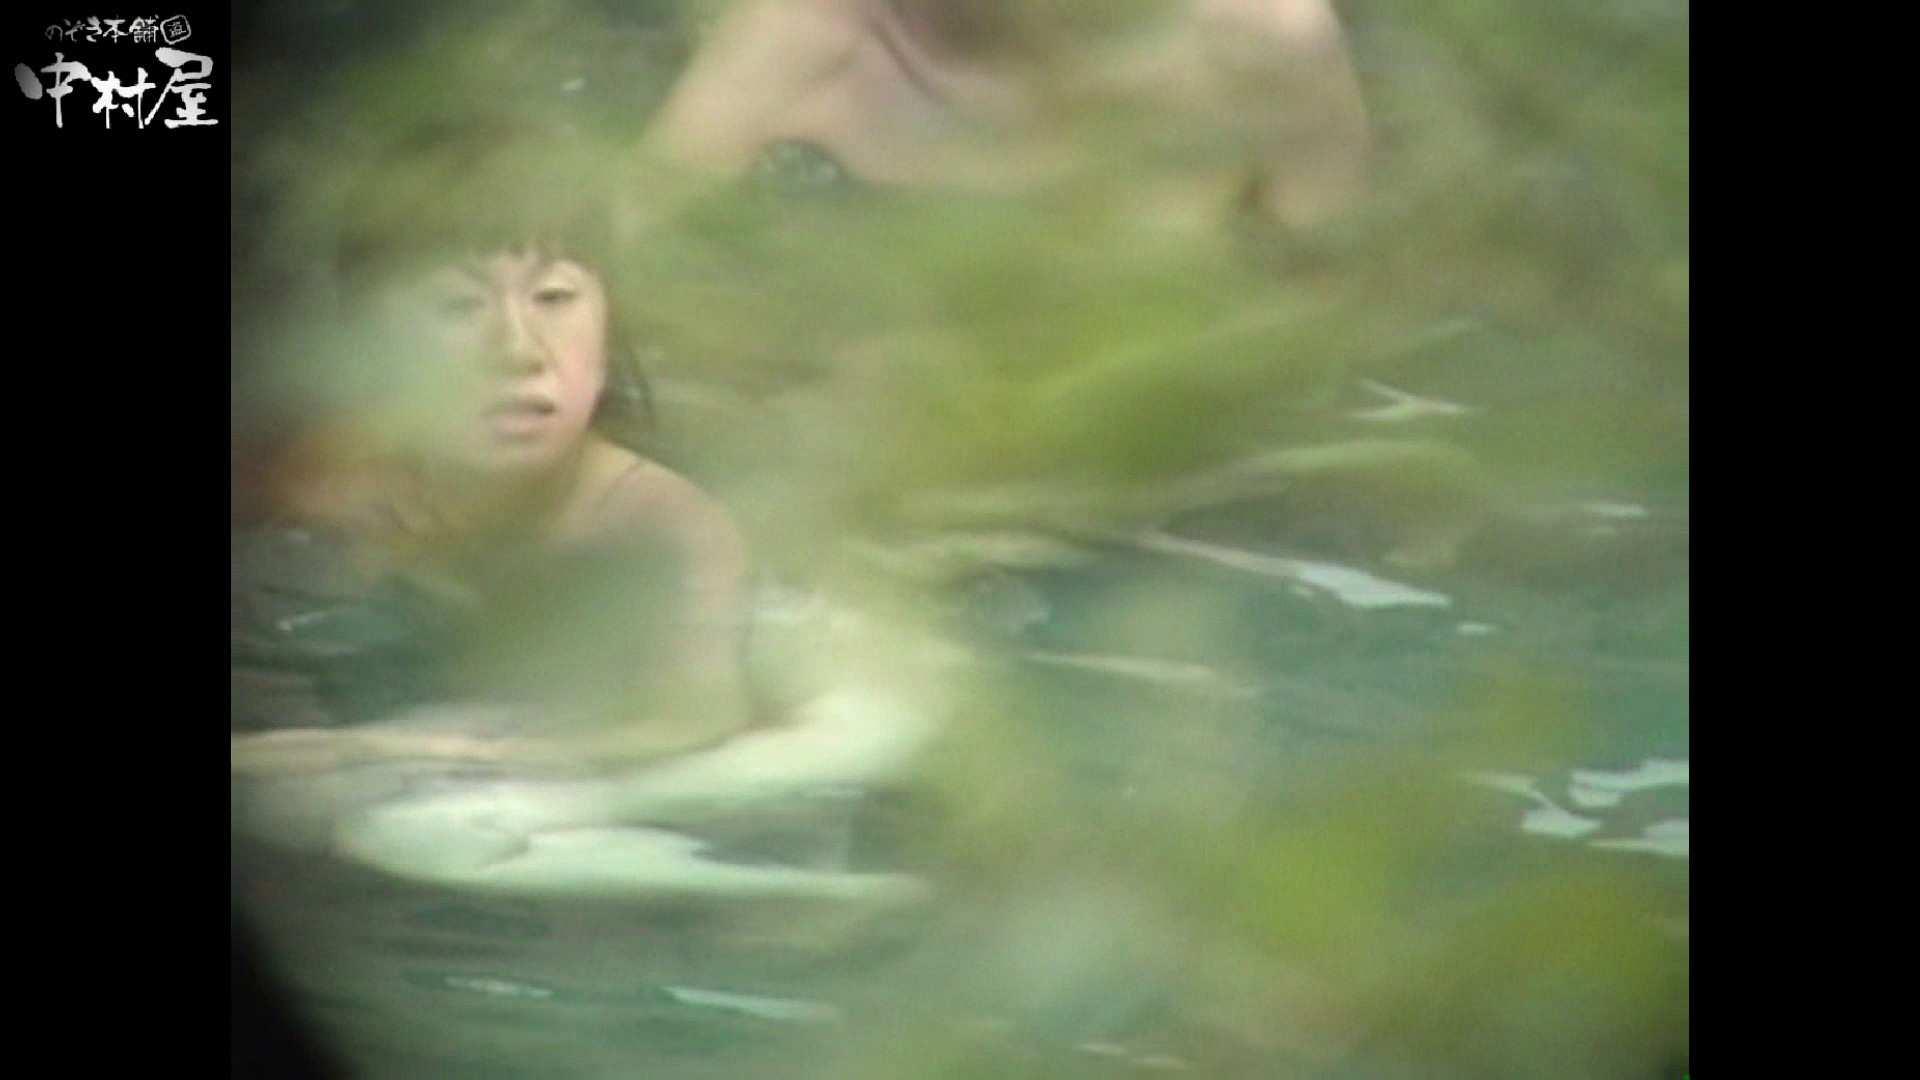 Aquaな露天風呂Vol.953 盗撮師作品   露天風呂突入  70pic 22